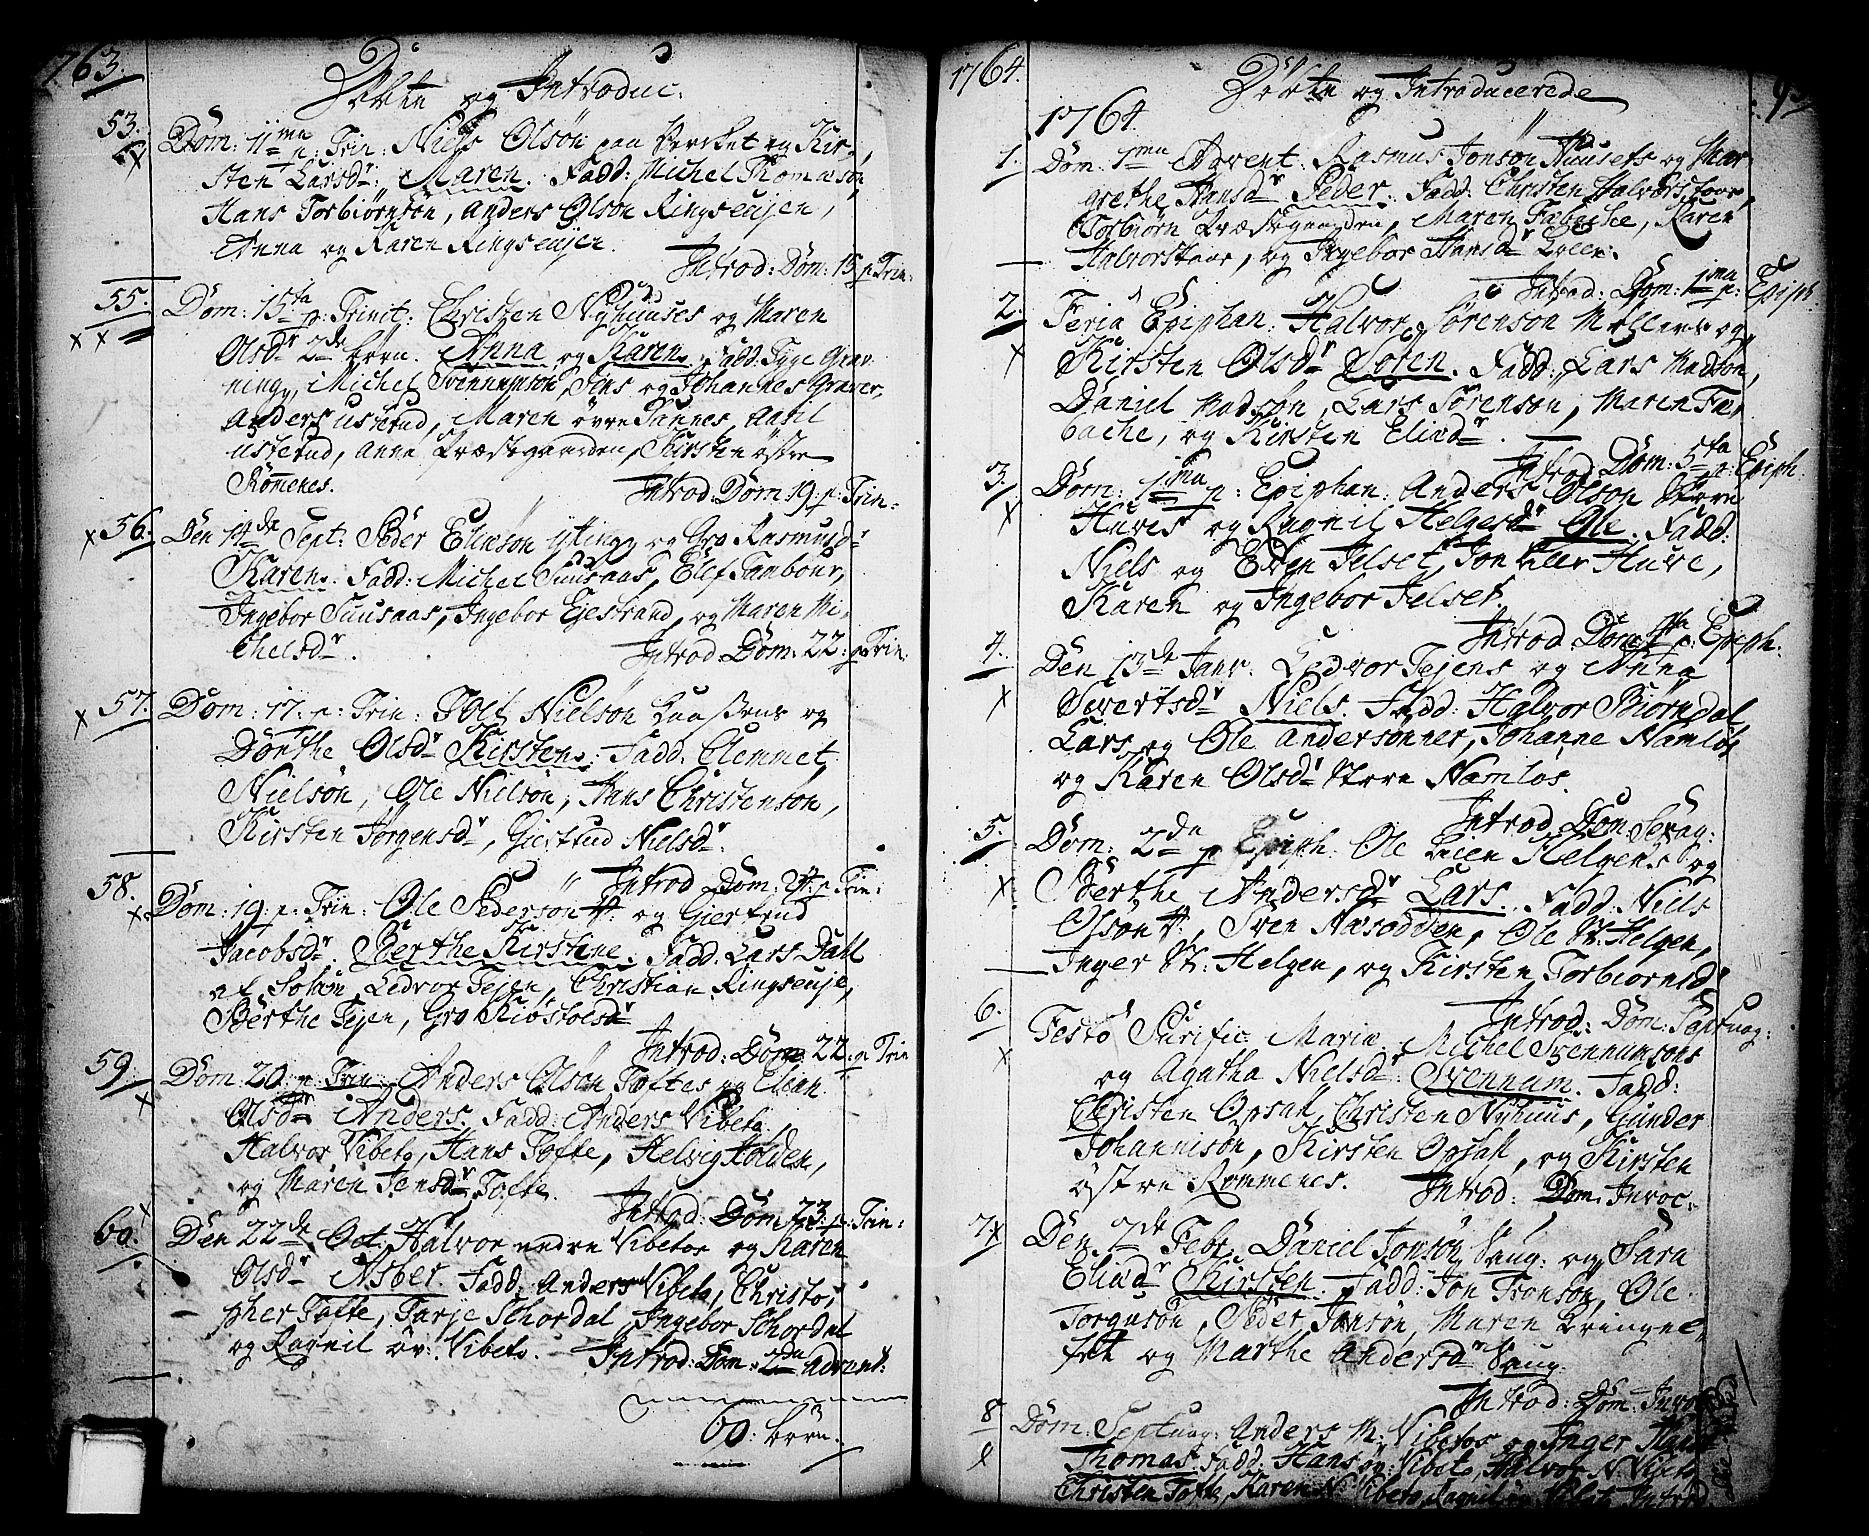 SAKO, Holla kirkebøker, F/Fa/L0001: Ministerialbok nr. 1, 1717-1779, s. 93